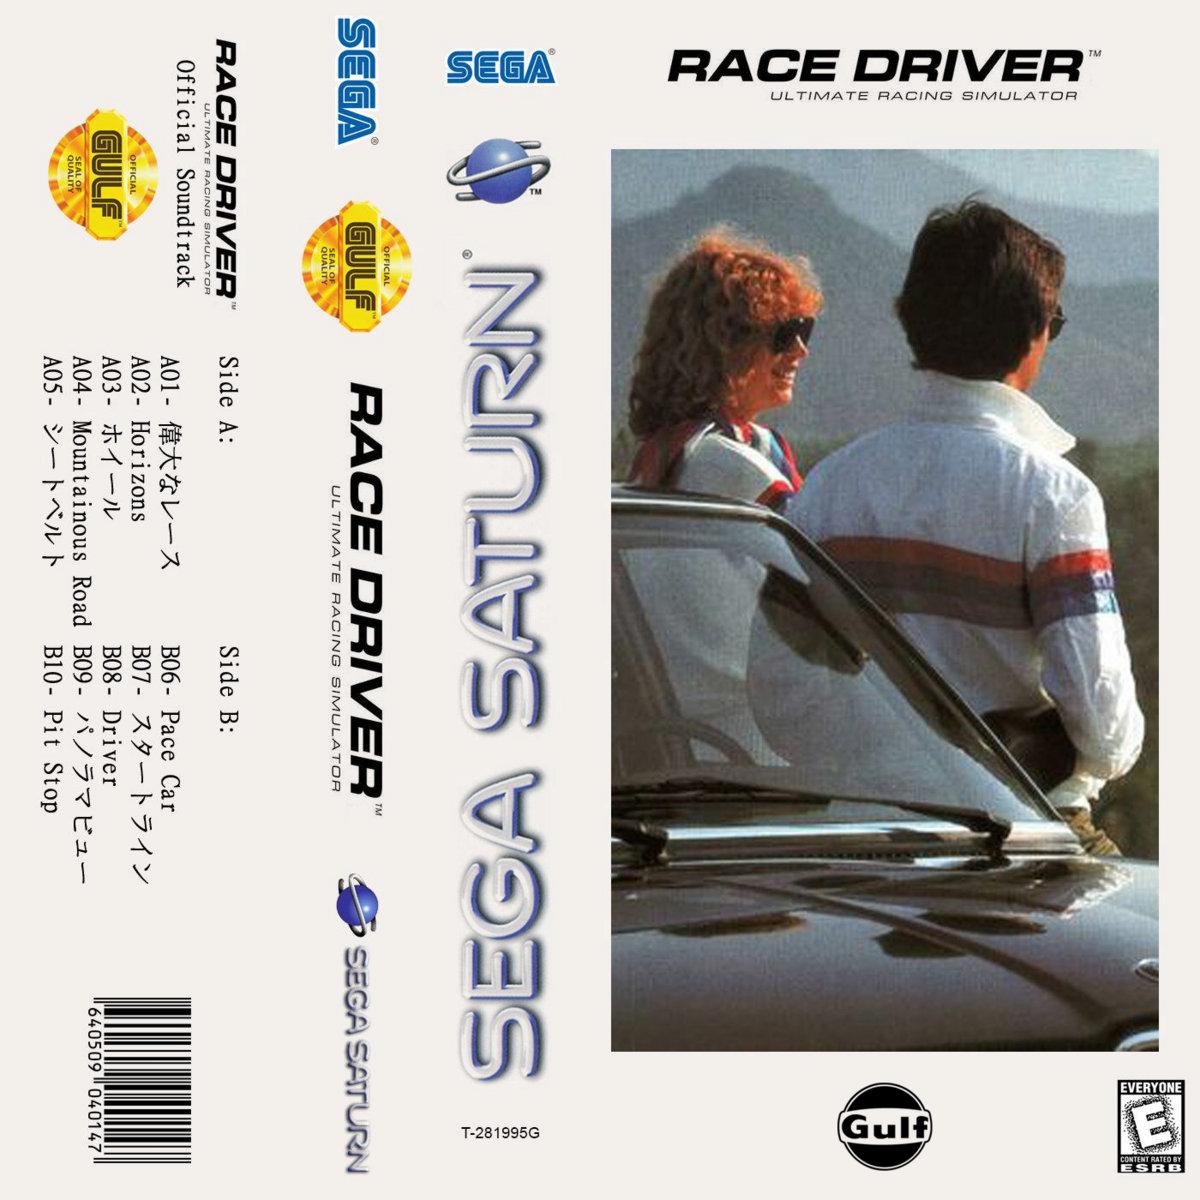 RACE DRIVER: Ultimate Racing Simulator | Gulf Audio Company